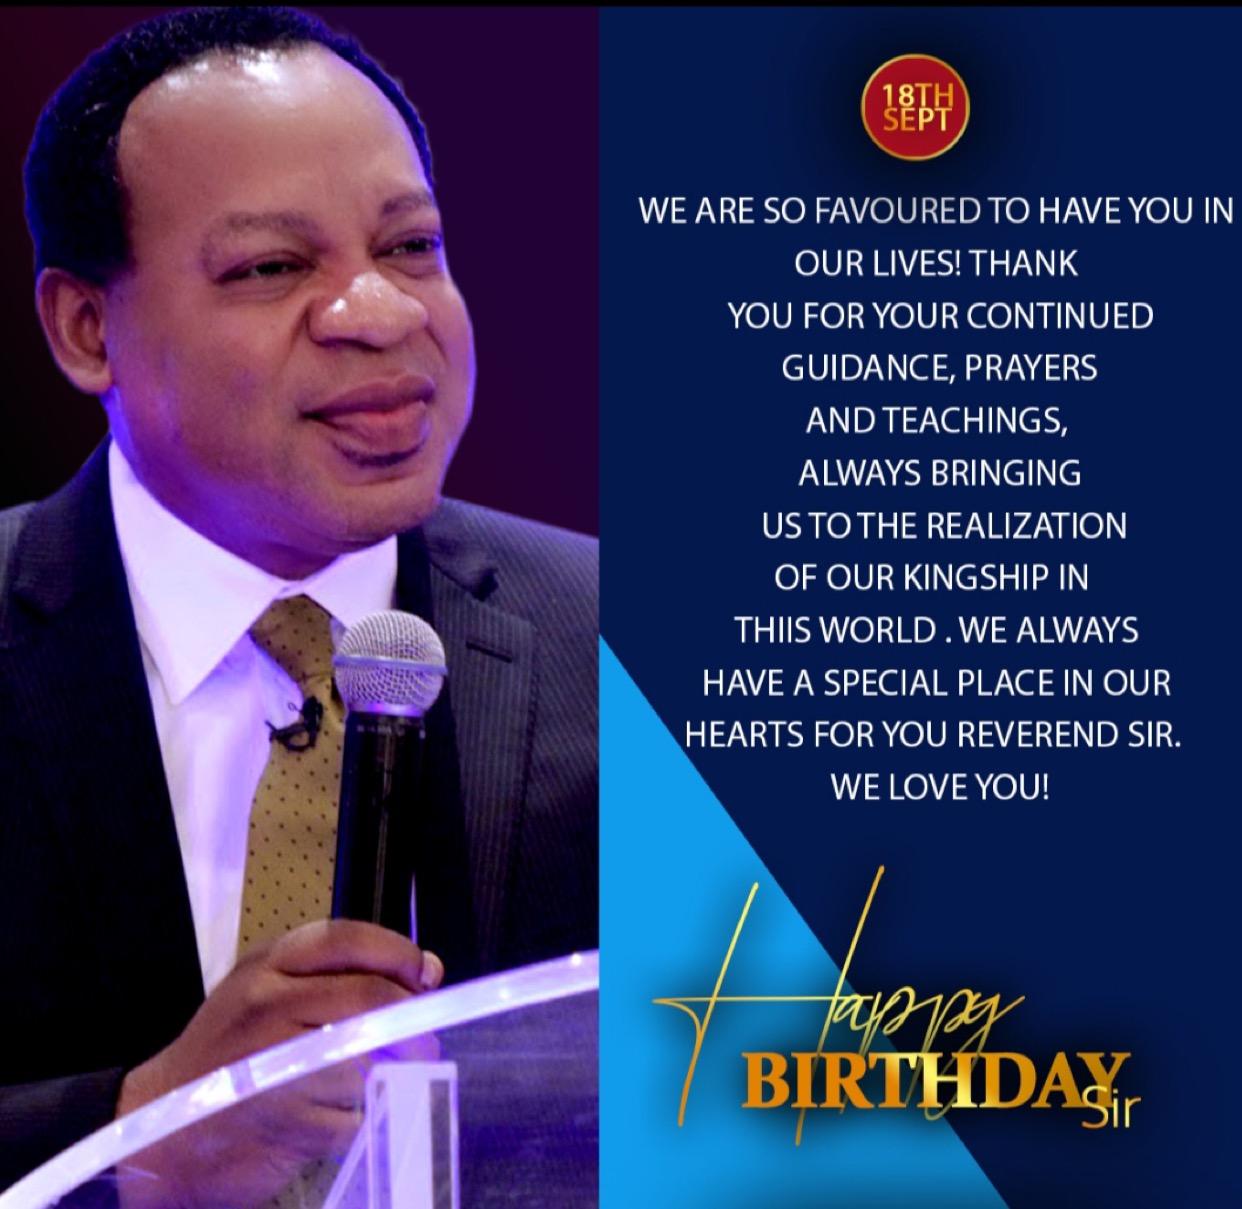 Happy Birthday Dear Rev Sir.